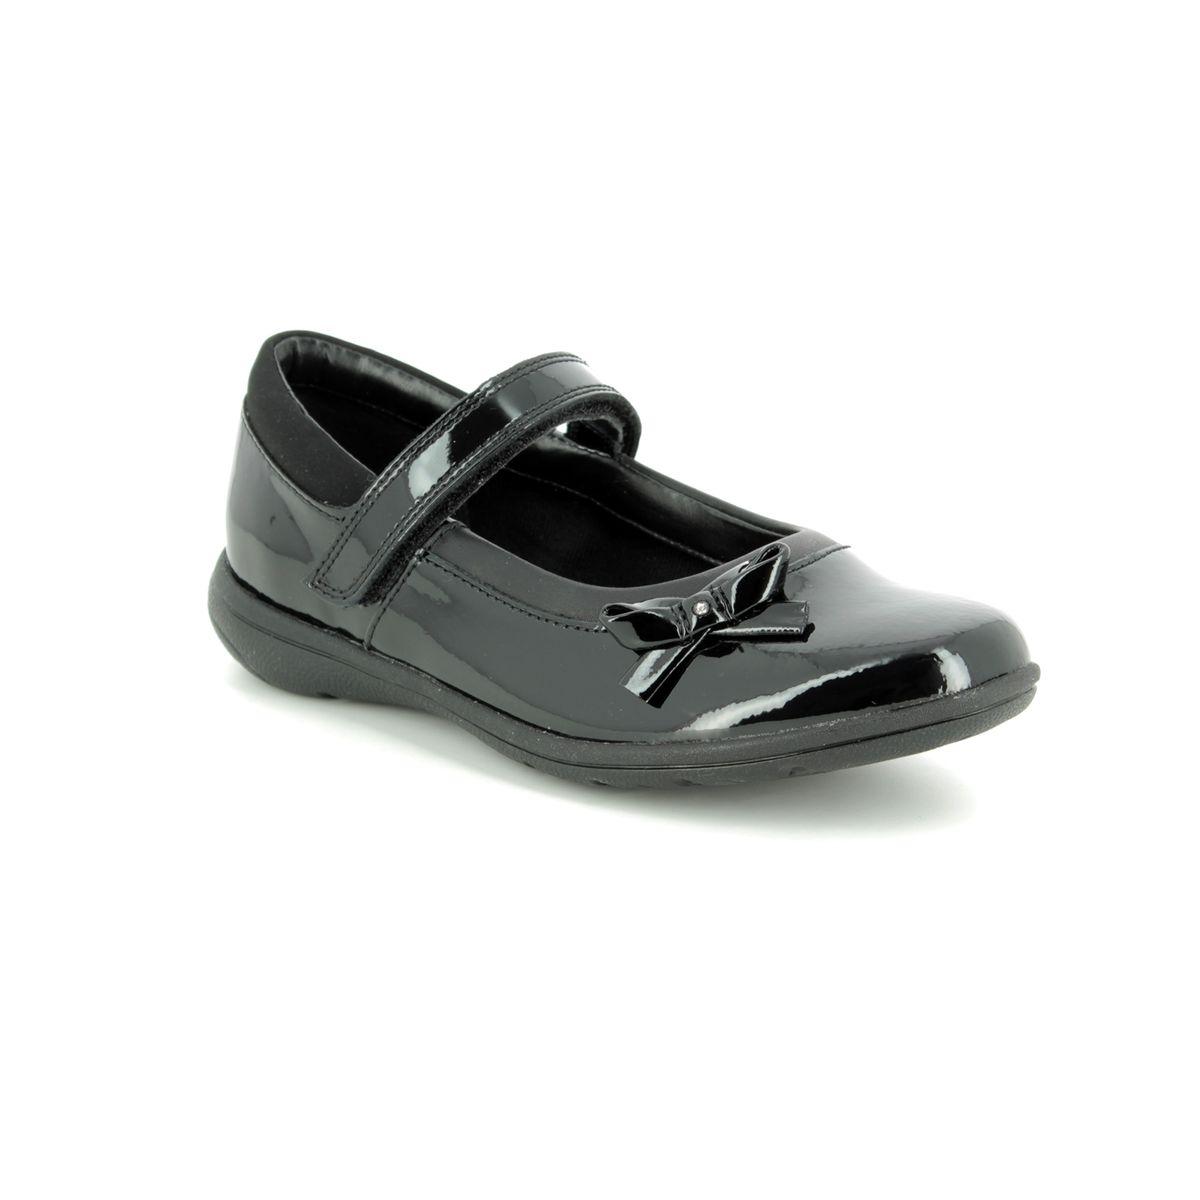 Clarks Scala Bright Girls School Shoes 2.5 UK Black Patent